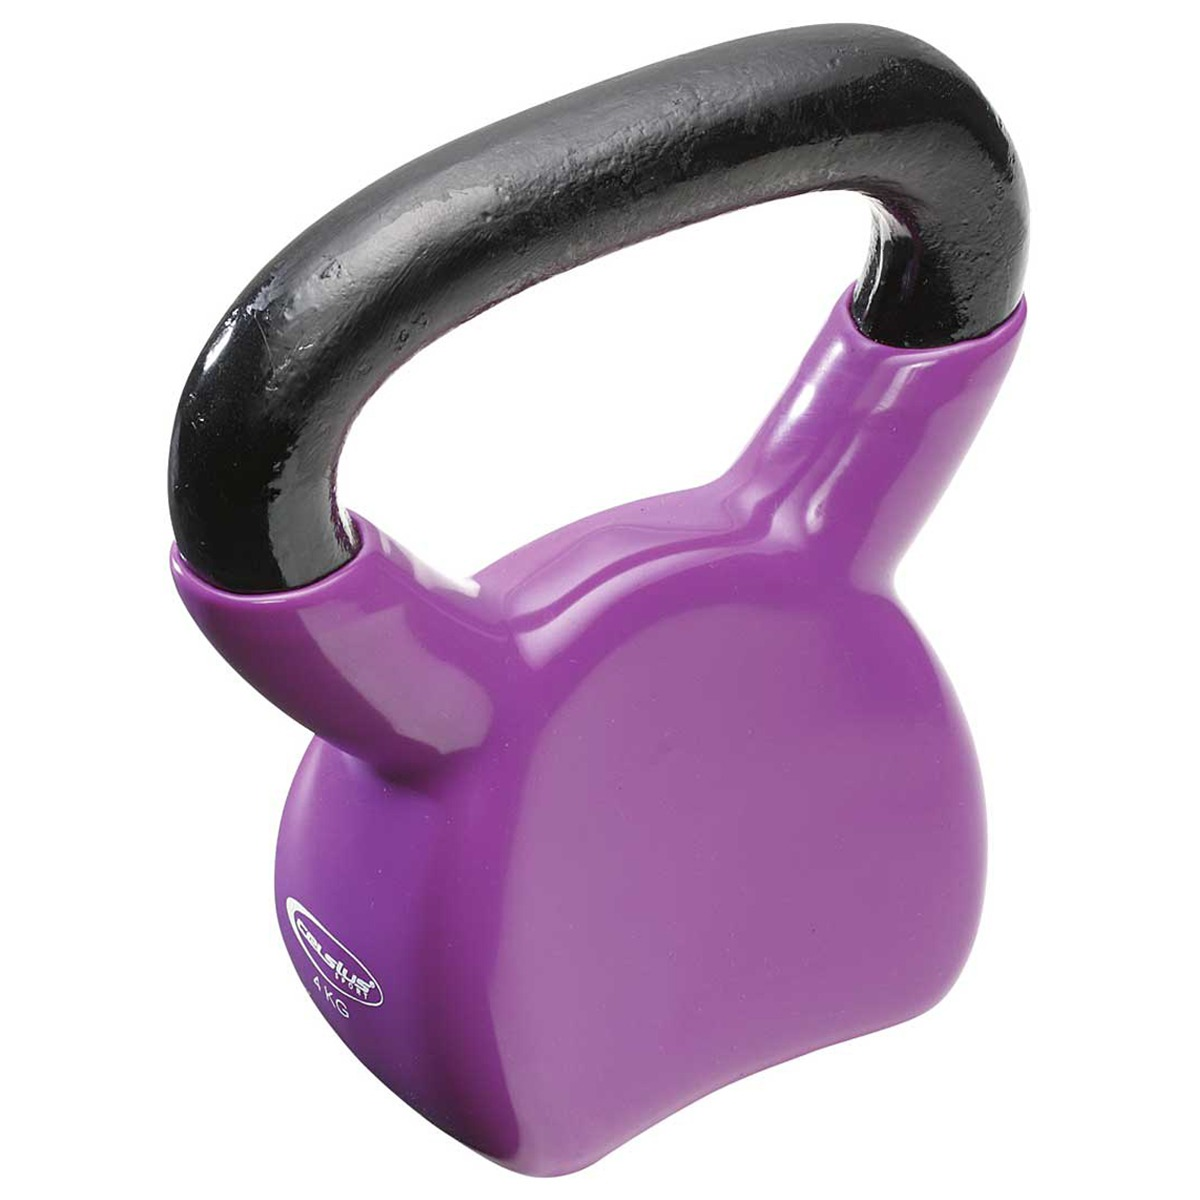 <strong>Celsius 4kg kettlebell </strong>